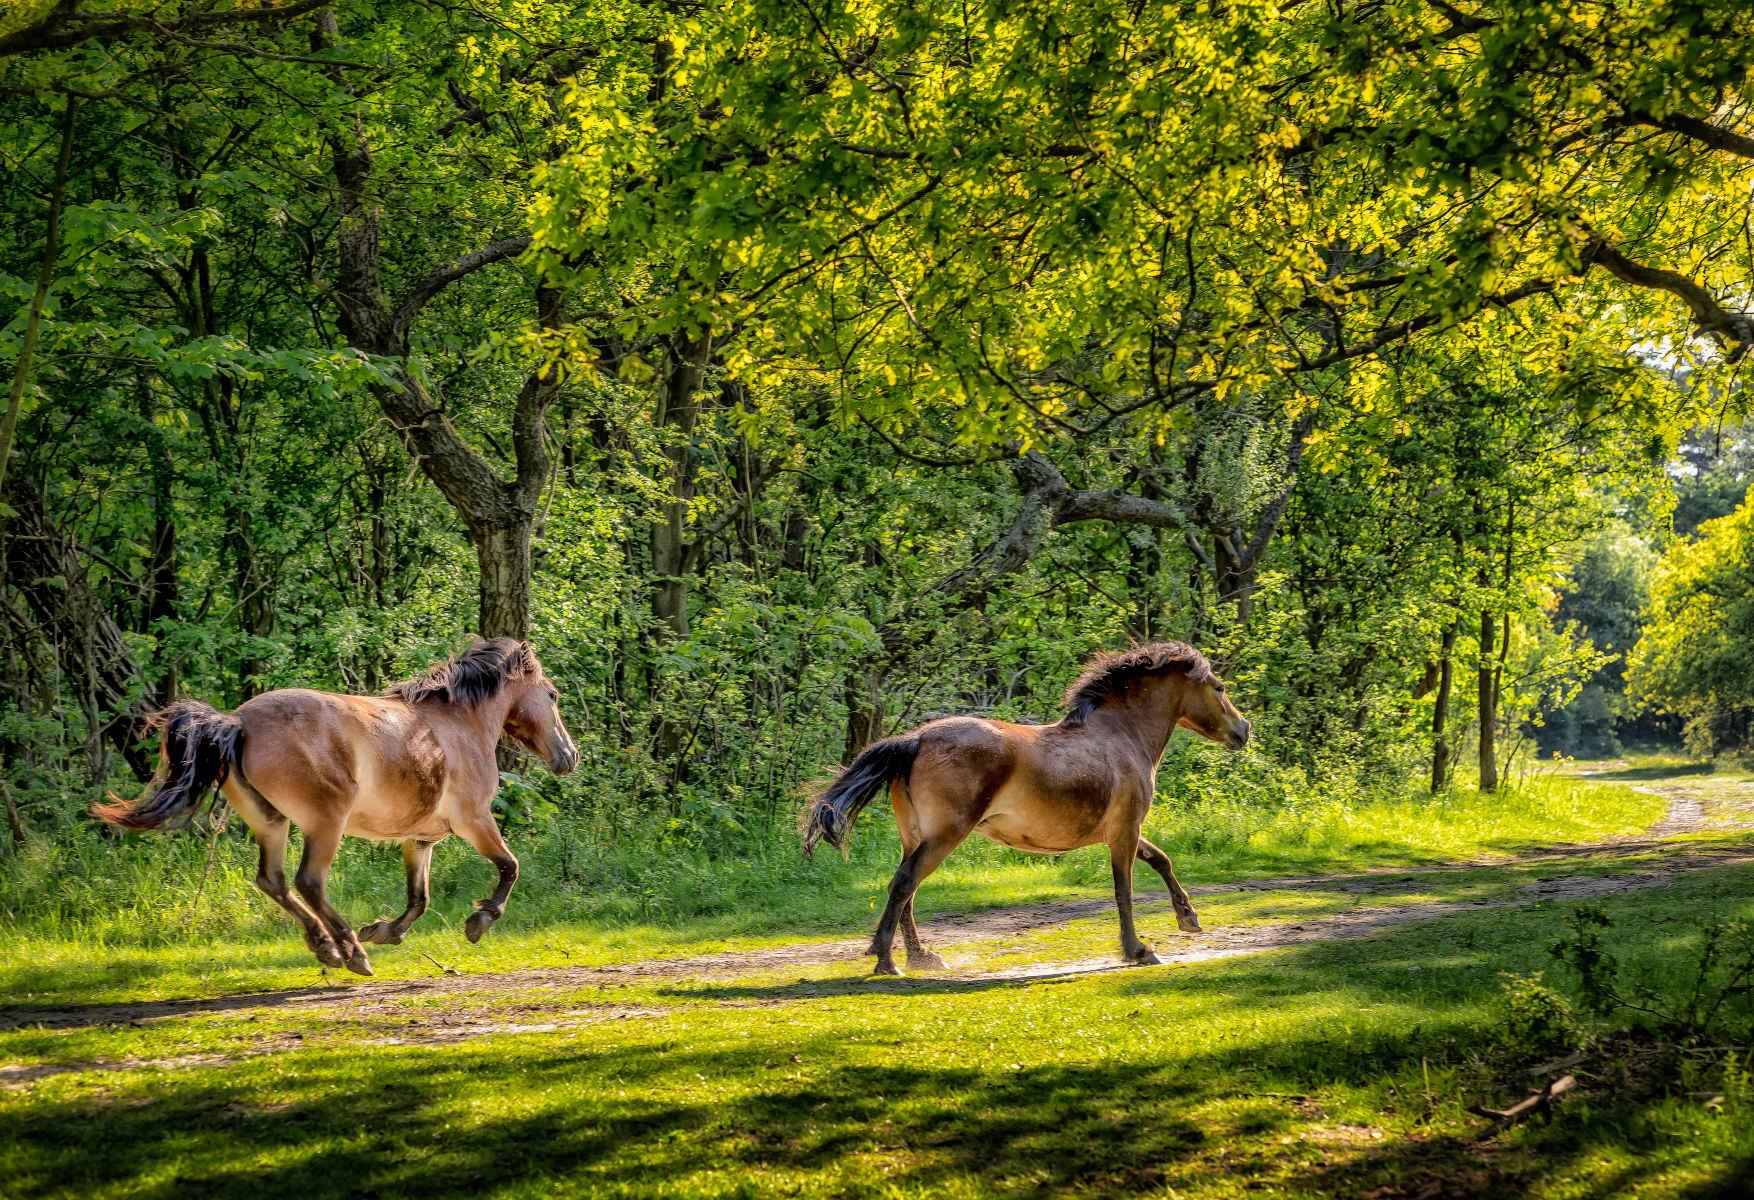 galloping in dappled evening light